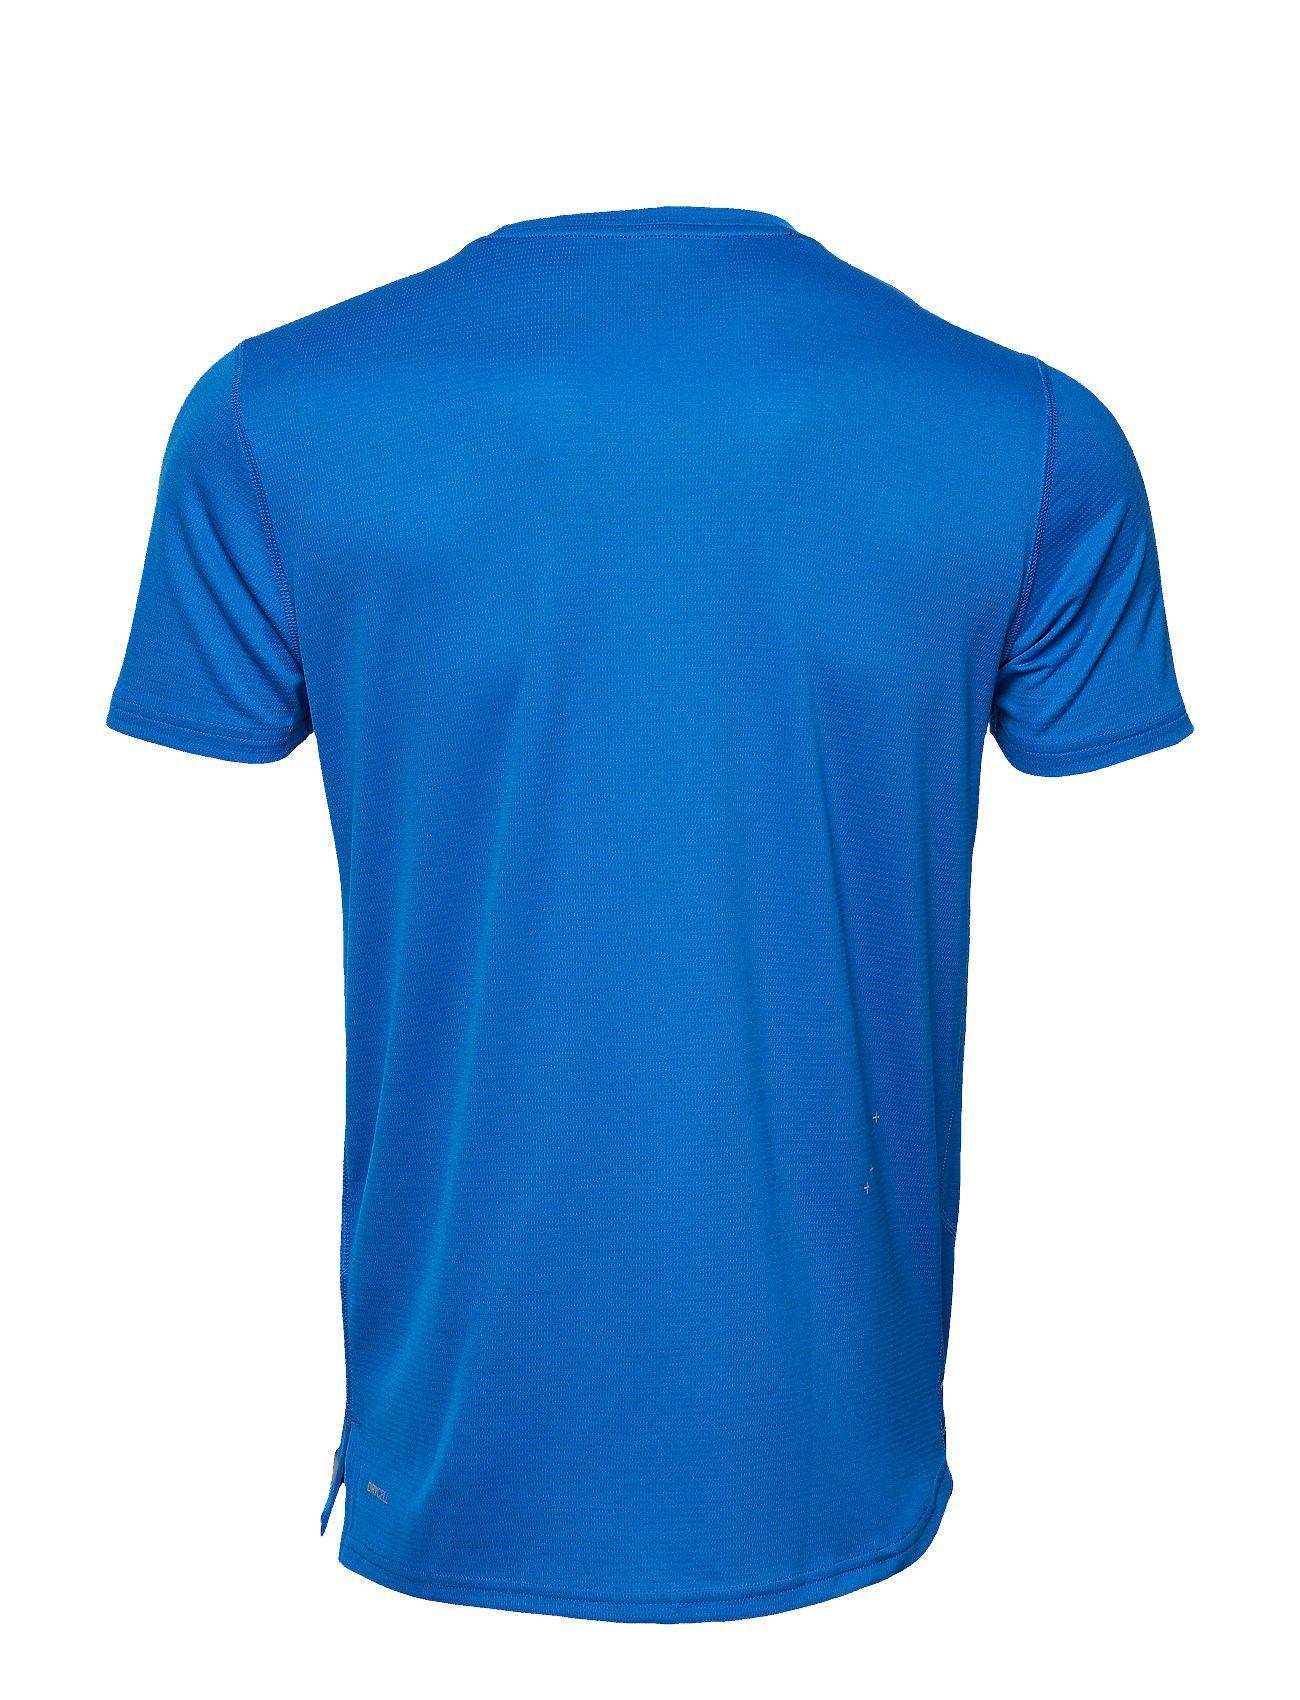 Camiseta Puma Ignite SS Tee Azul